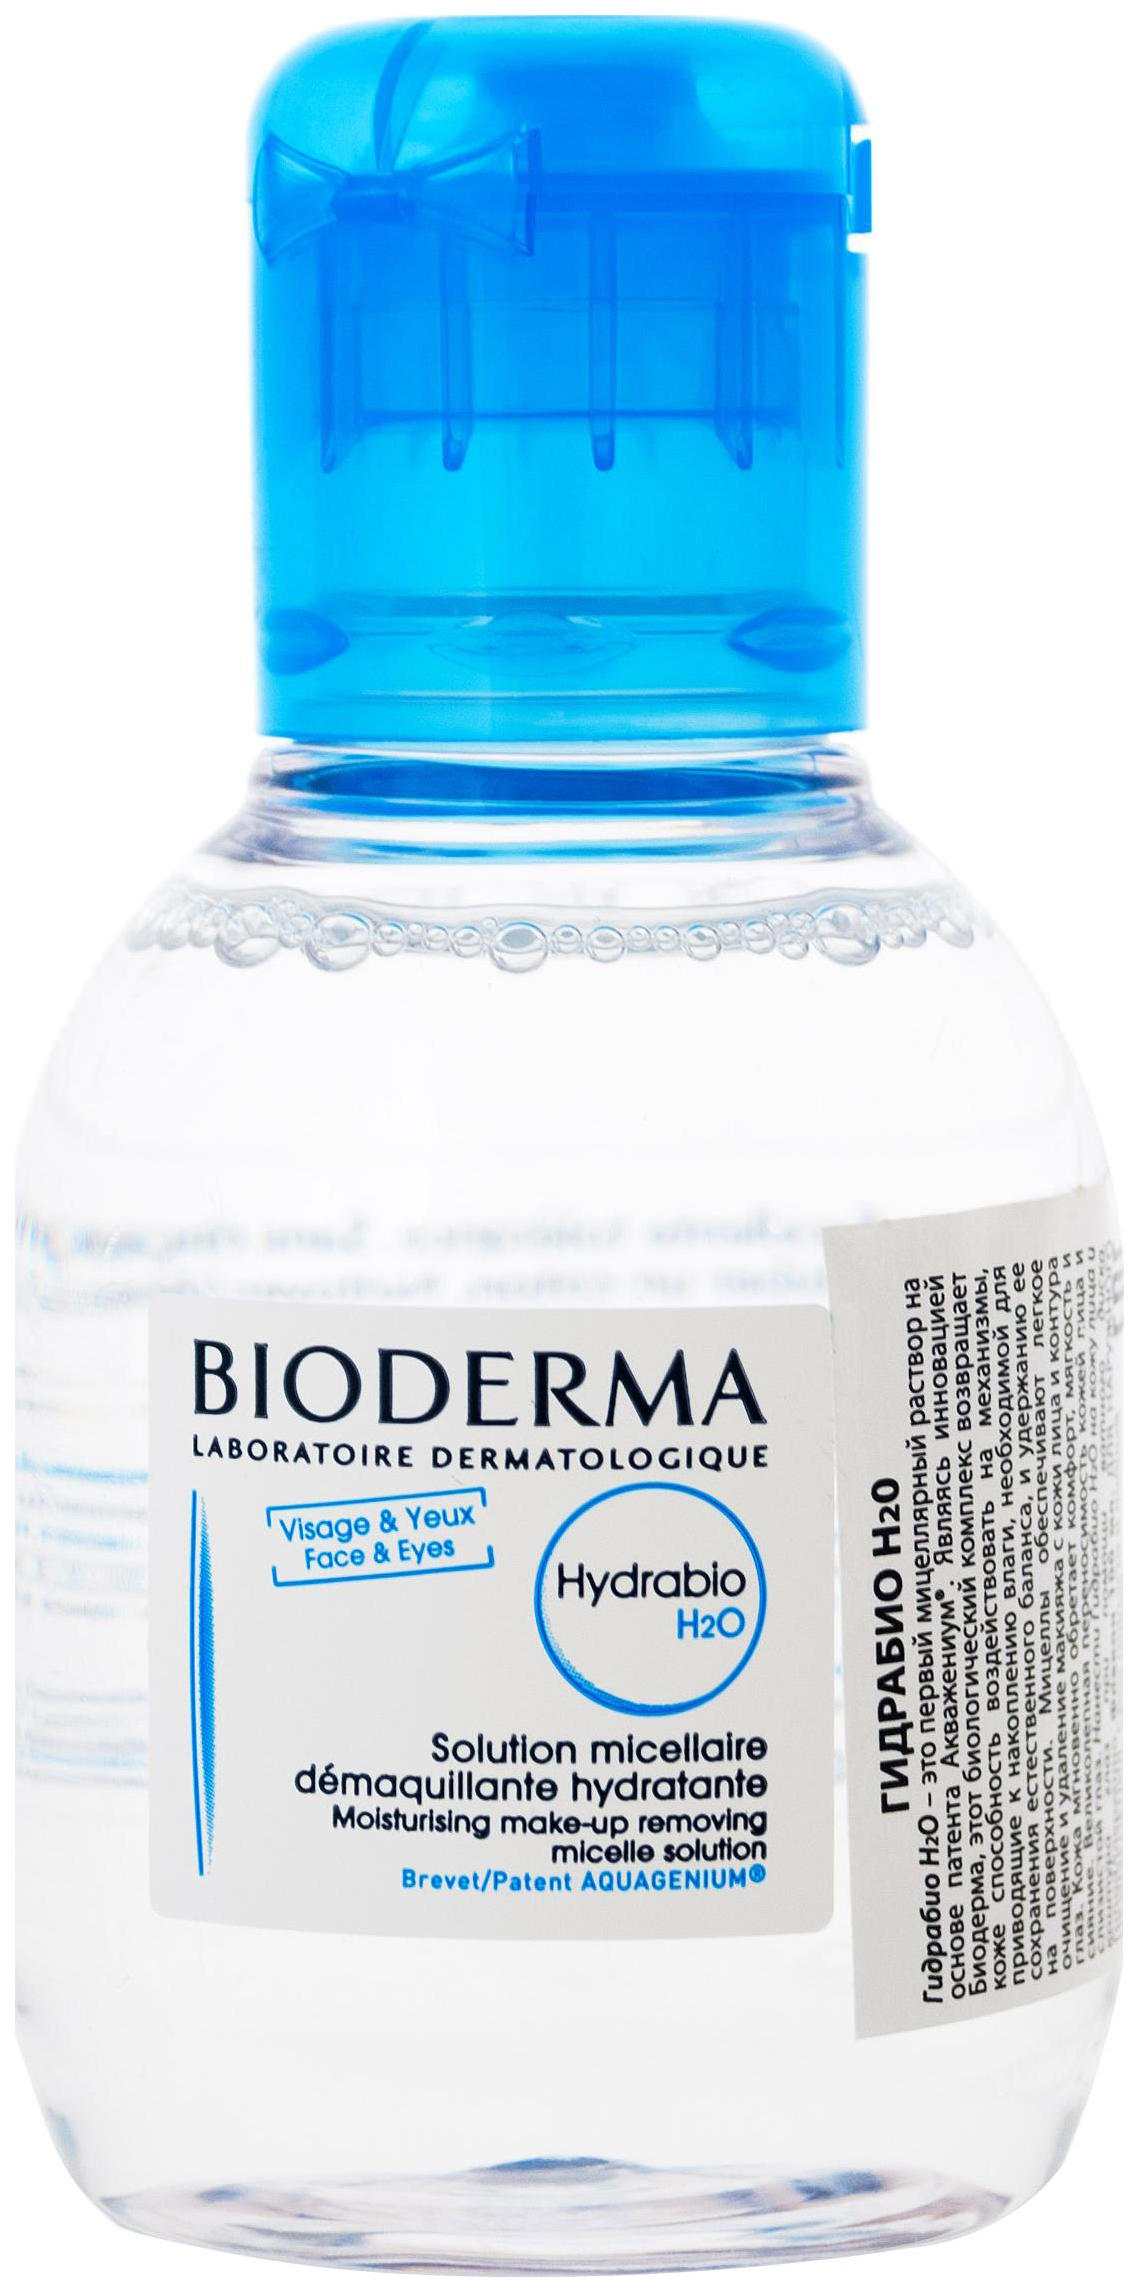 Мицеллярная вода Bioderma Hydrabio H2O   Micelle